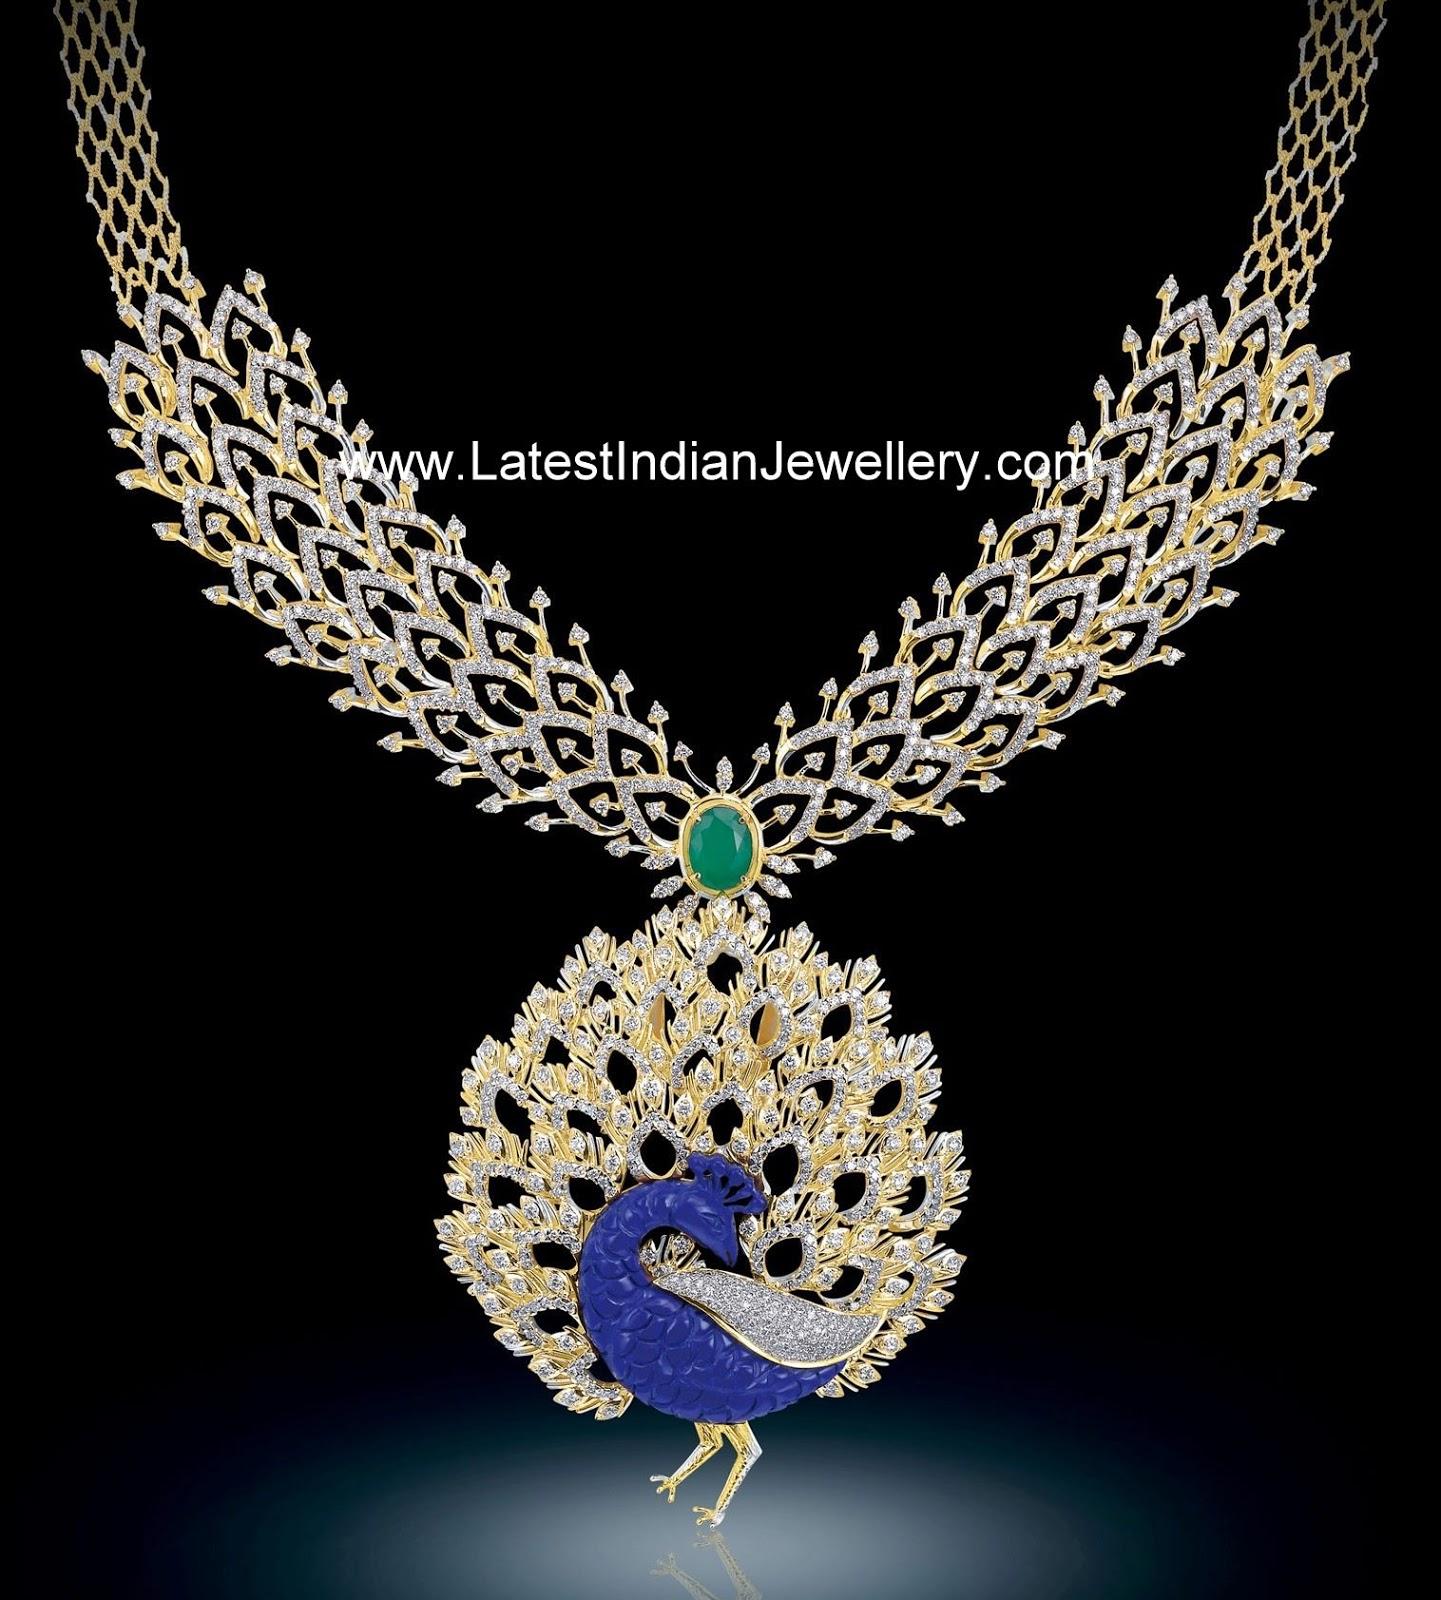 Bhima Jewellery Bands: Brilliant Designer Diamond Necklace With Peacock Pendant